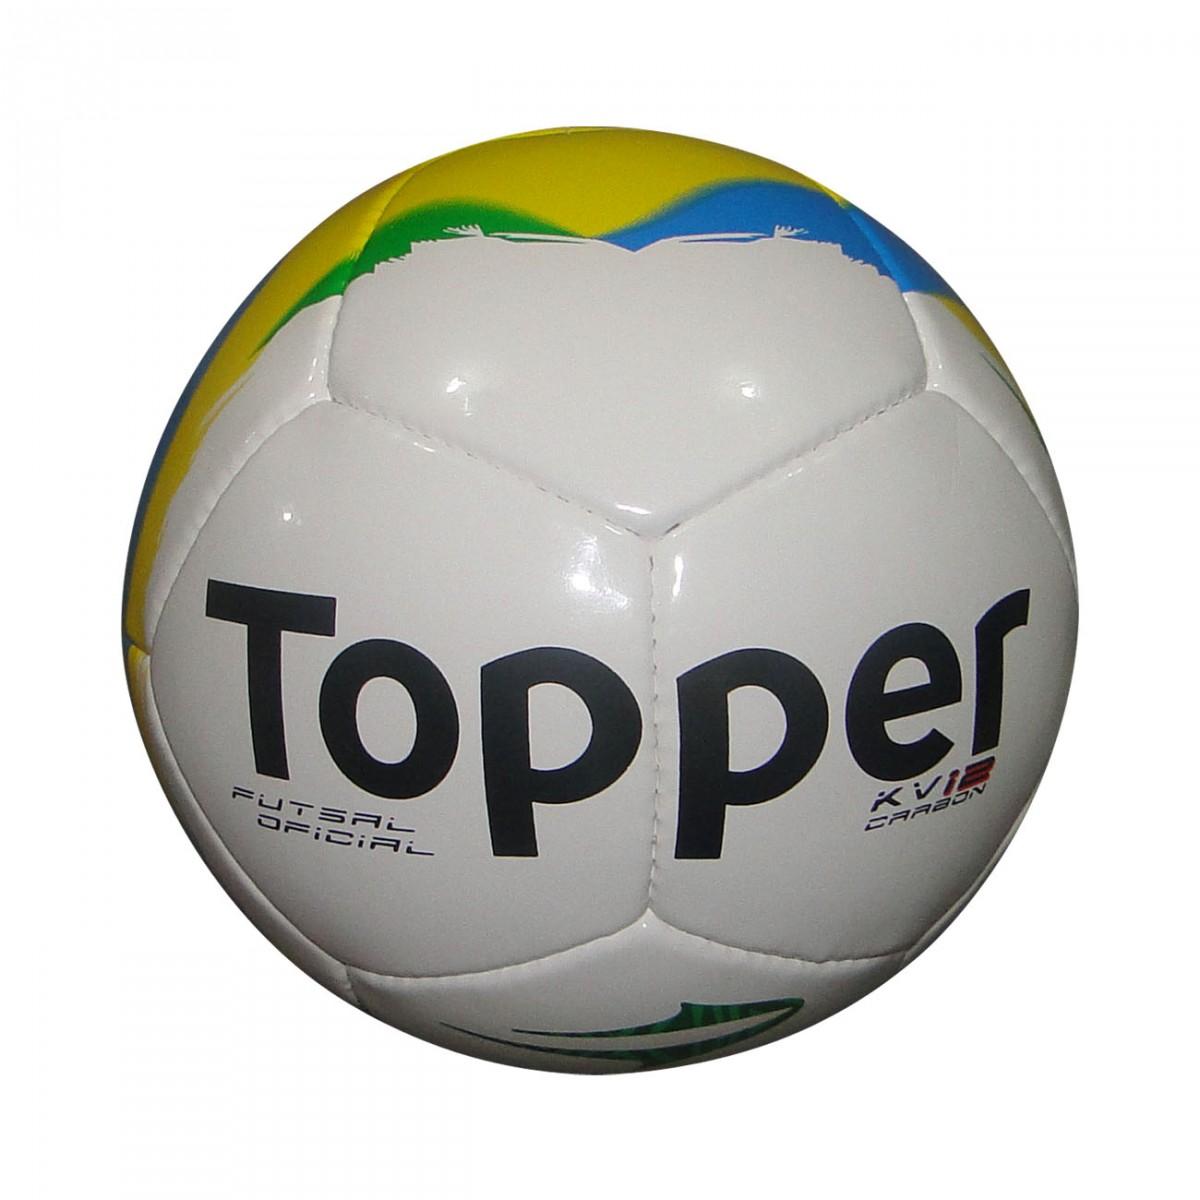 Bola Topper Kv 12 Carbon Futsal 4130756 0338 998 - Branco Amarelo Azul -  Chuteira Nike 574f3713a564b